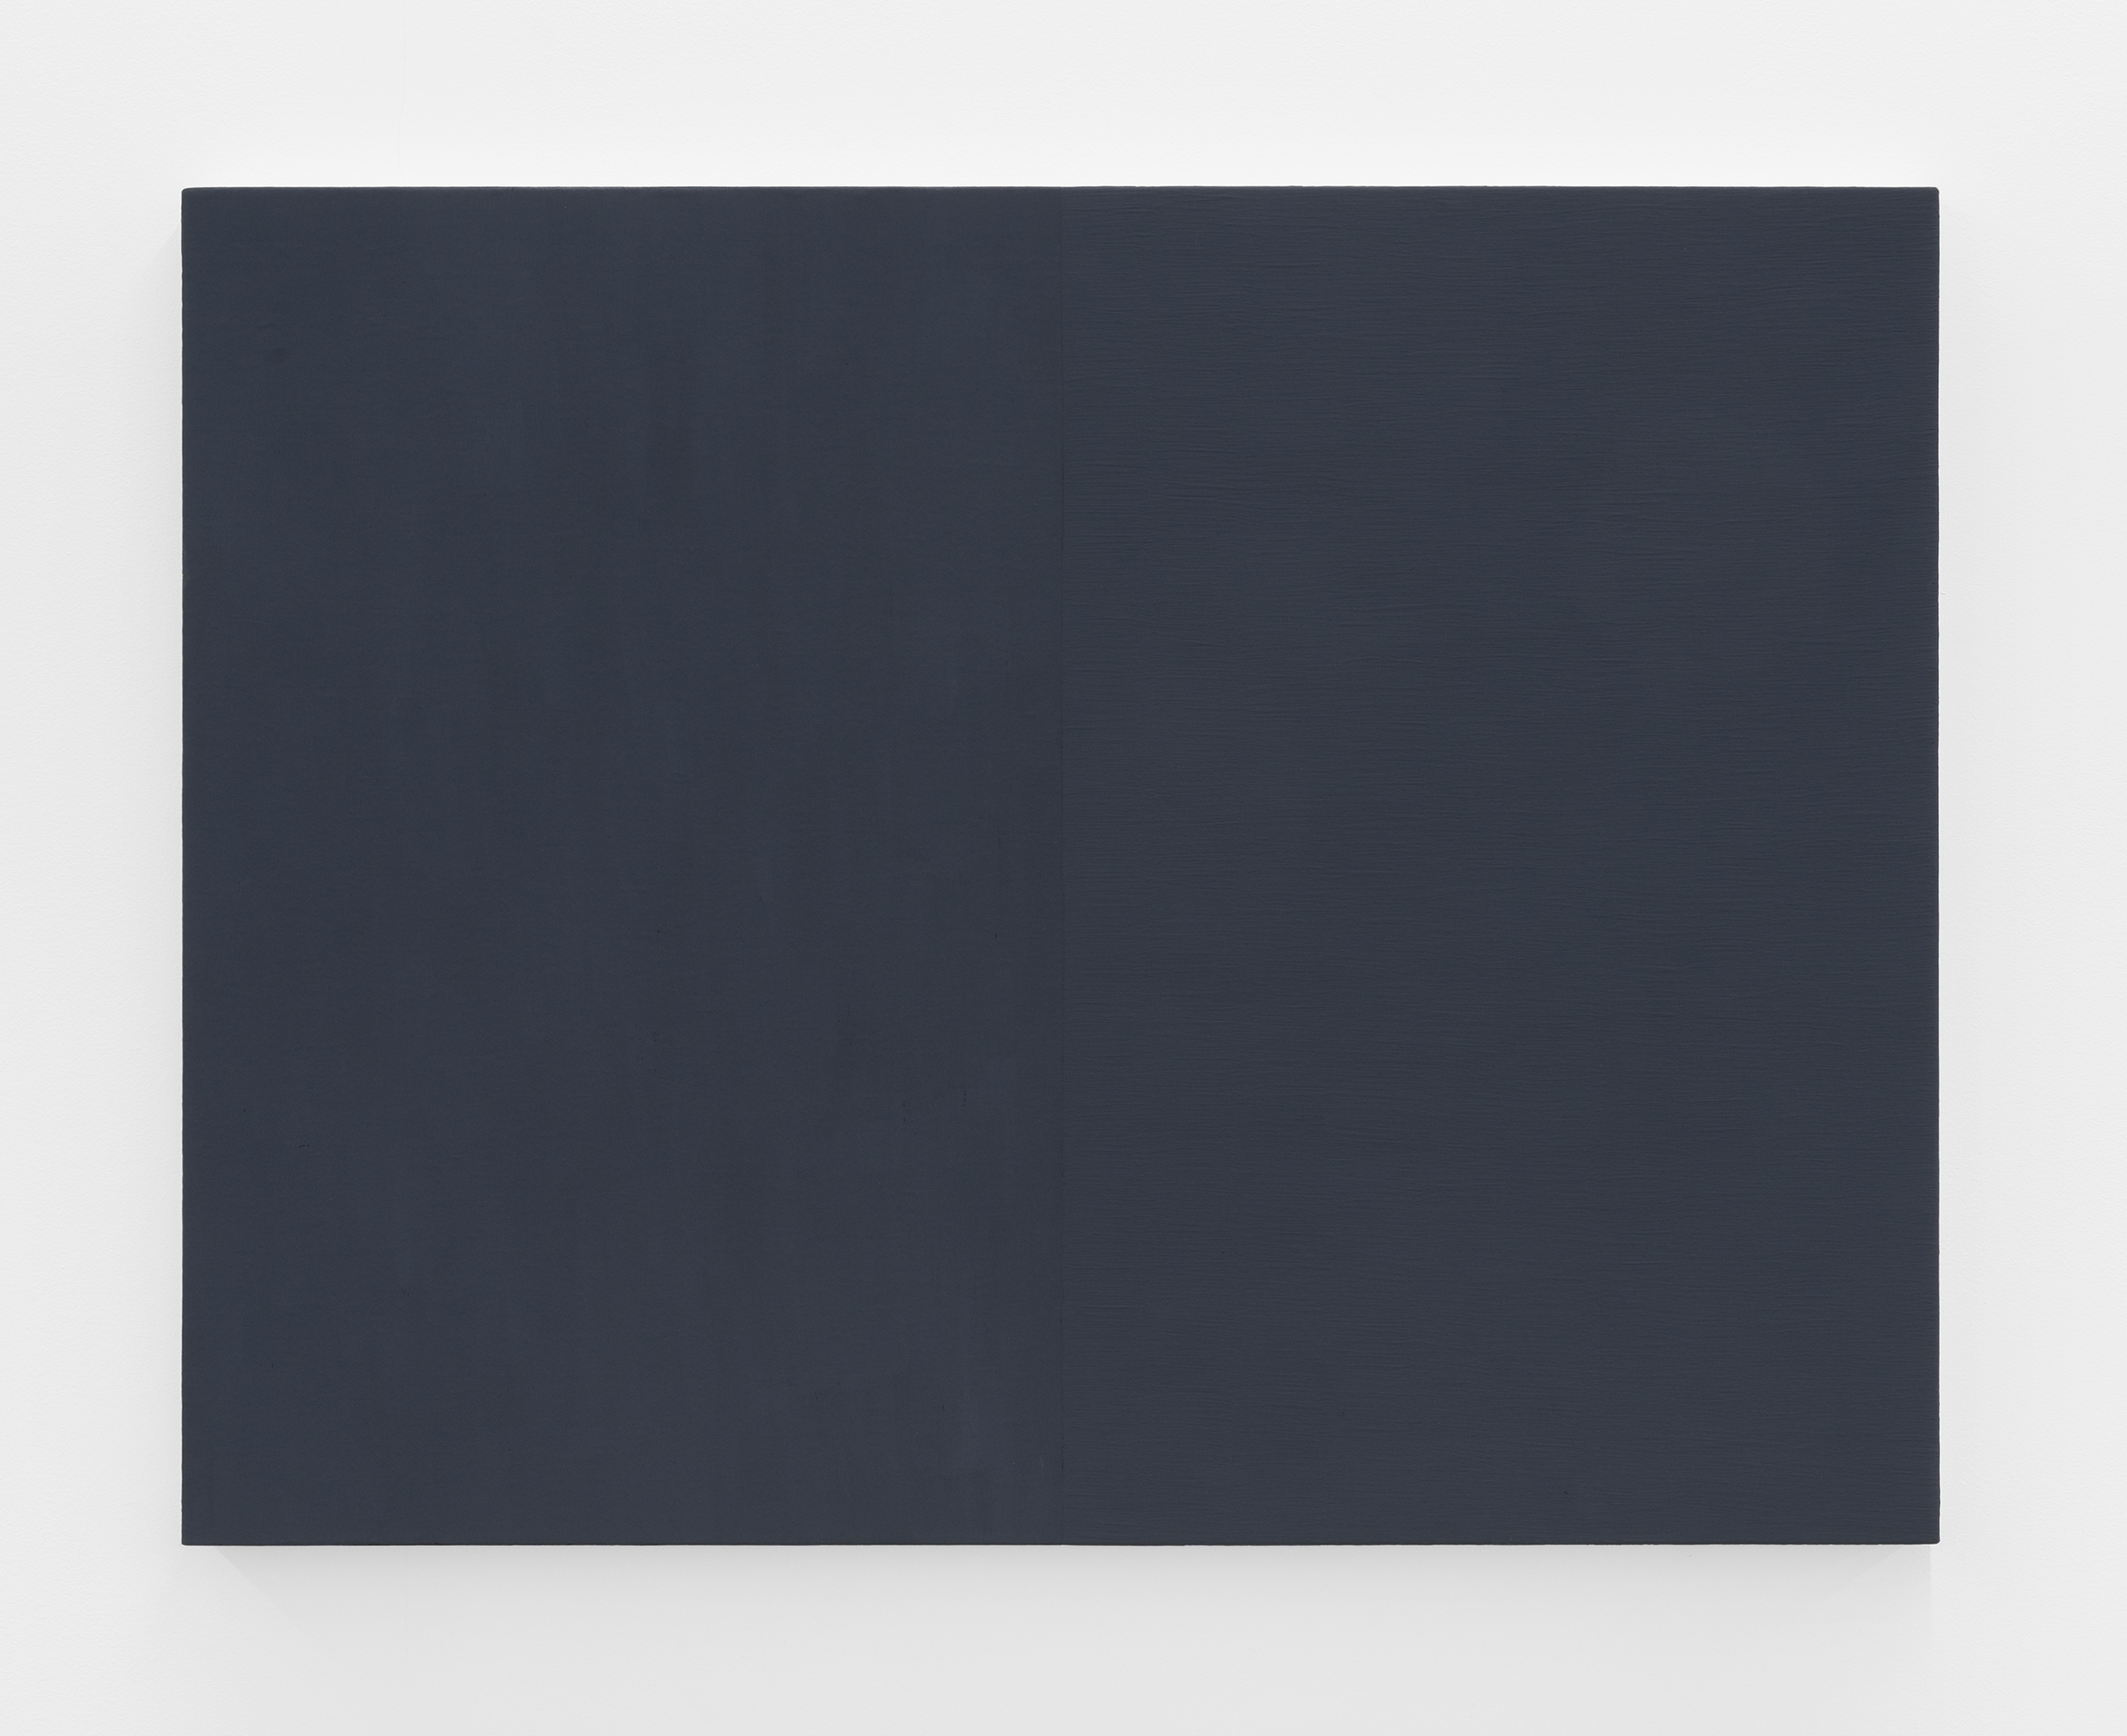 Edith Baumann  Untitled #6,  1979 acrylic on canvas 36 x 46 - 3/4 inches